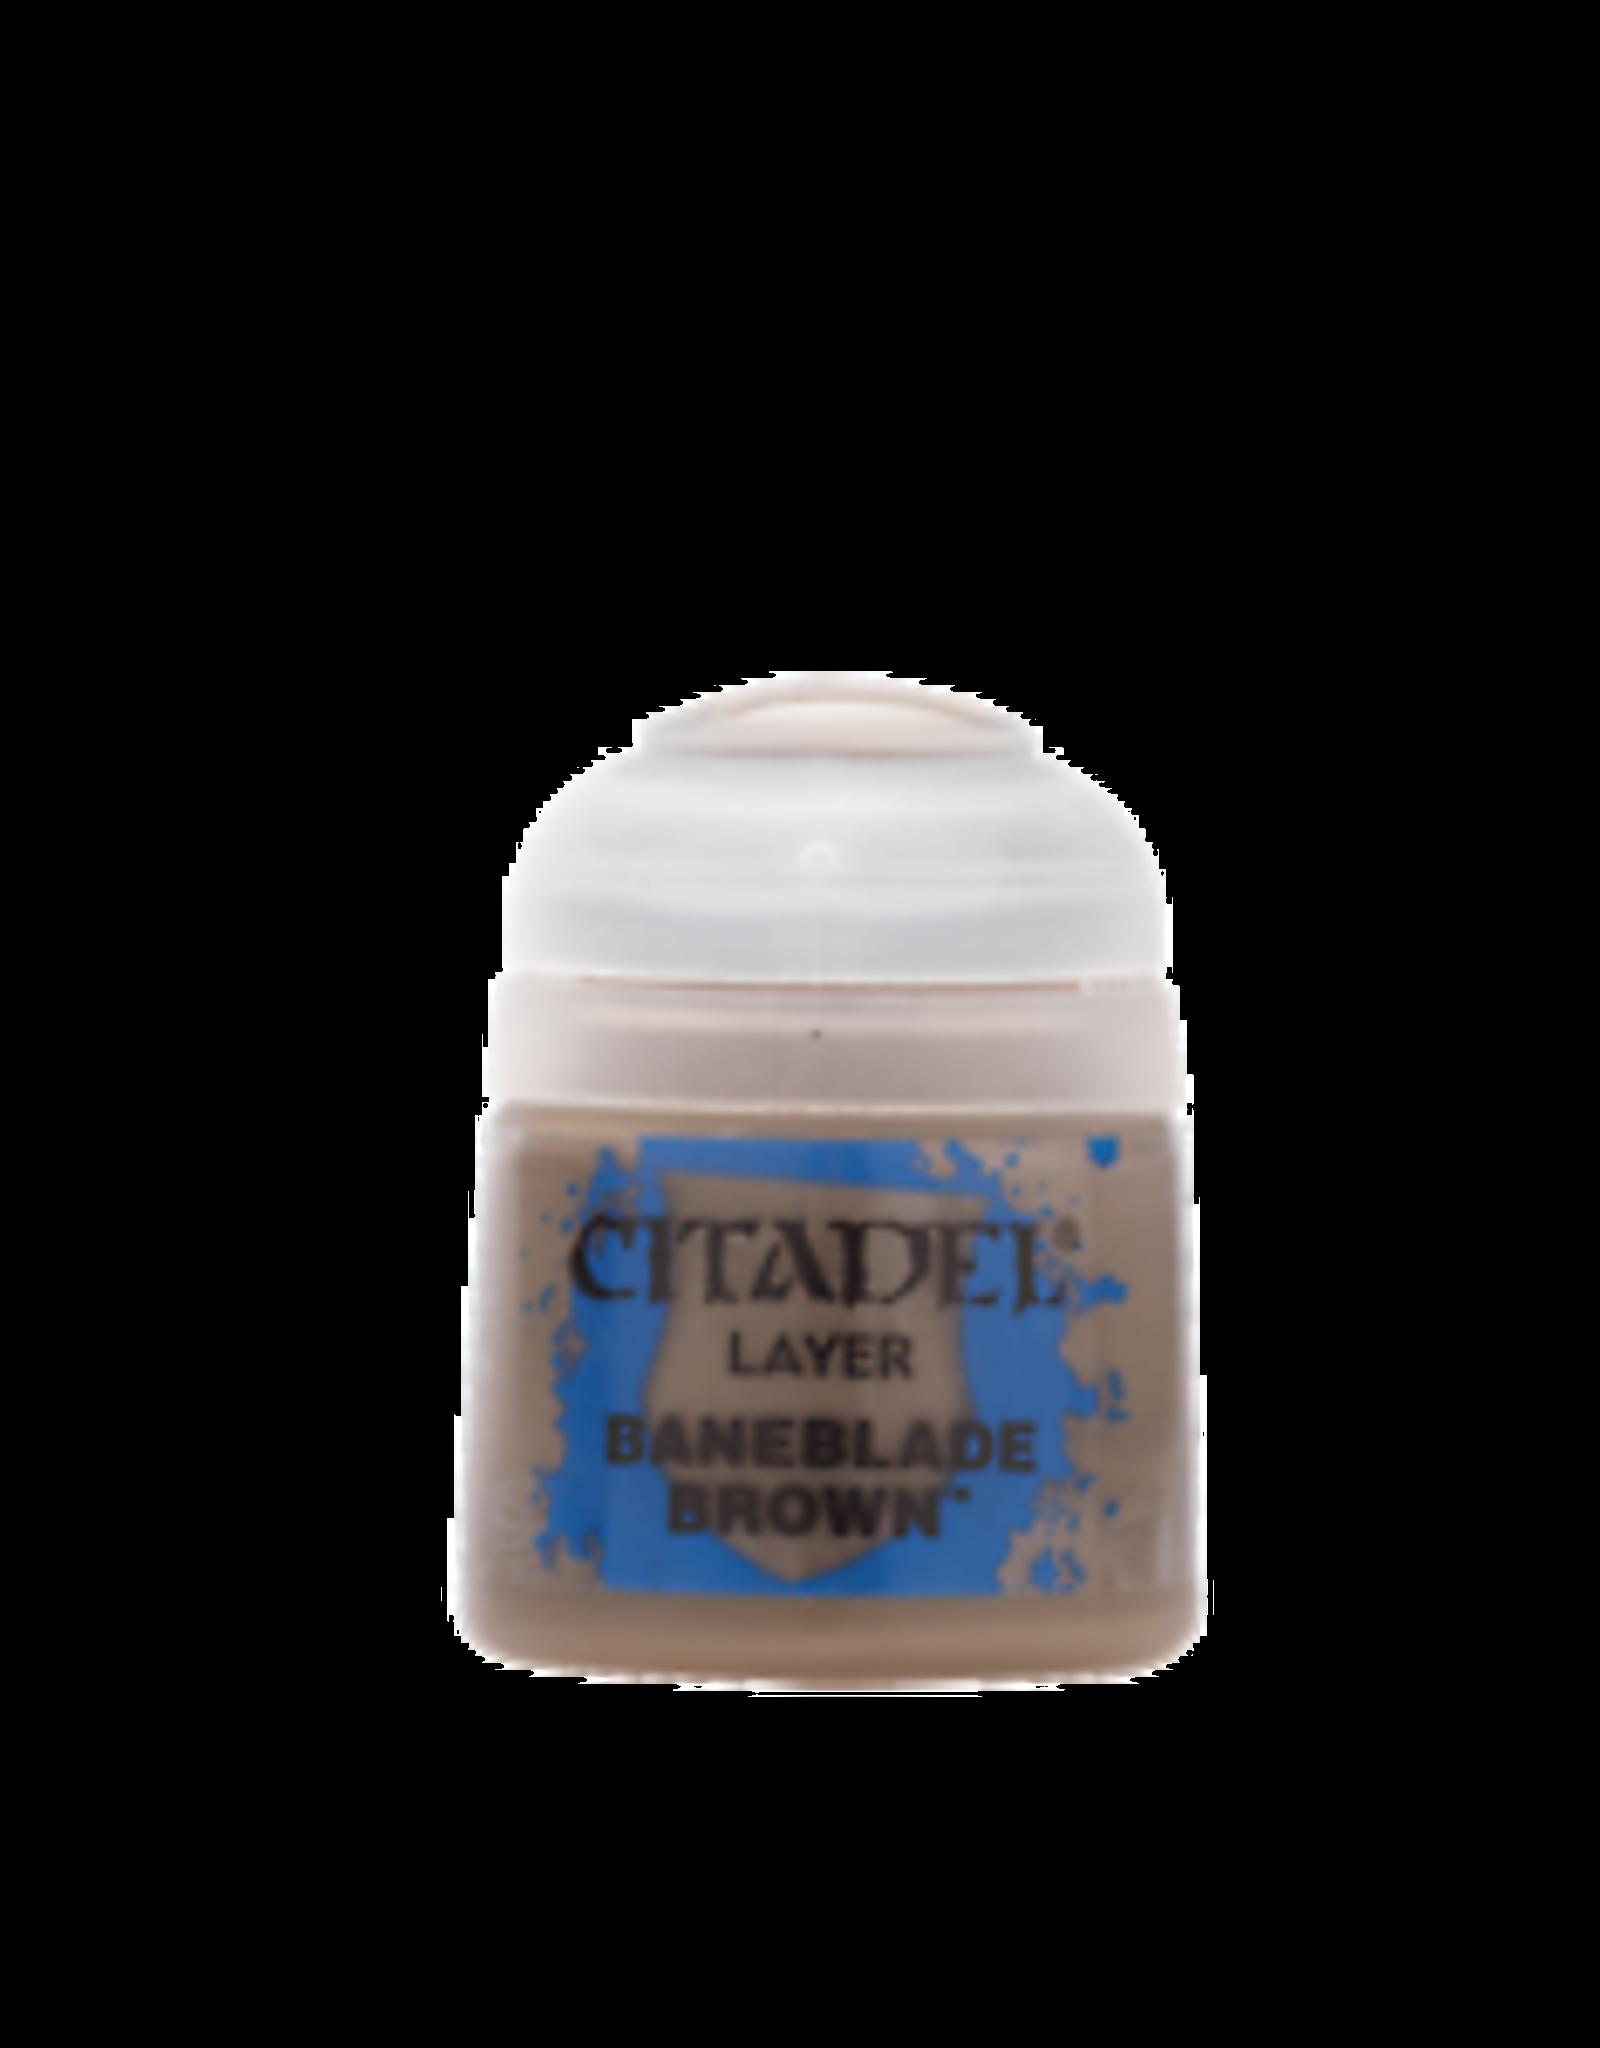 Citadel Paint Baneblade Brown